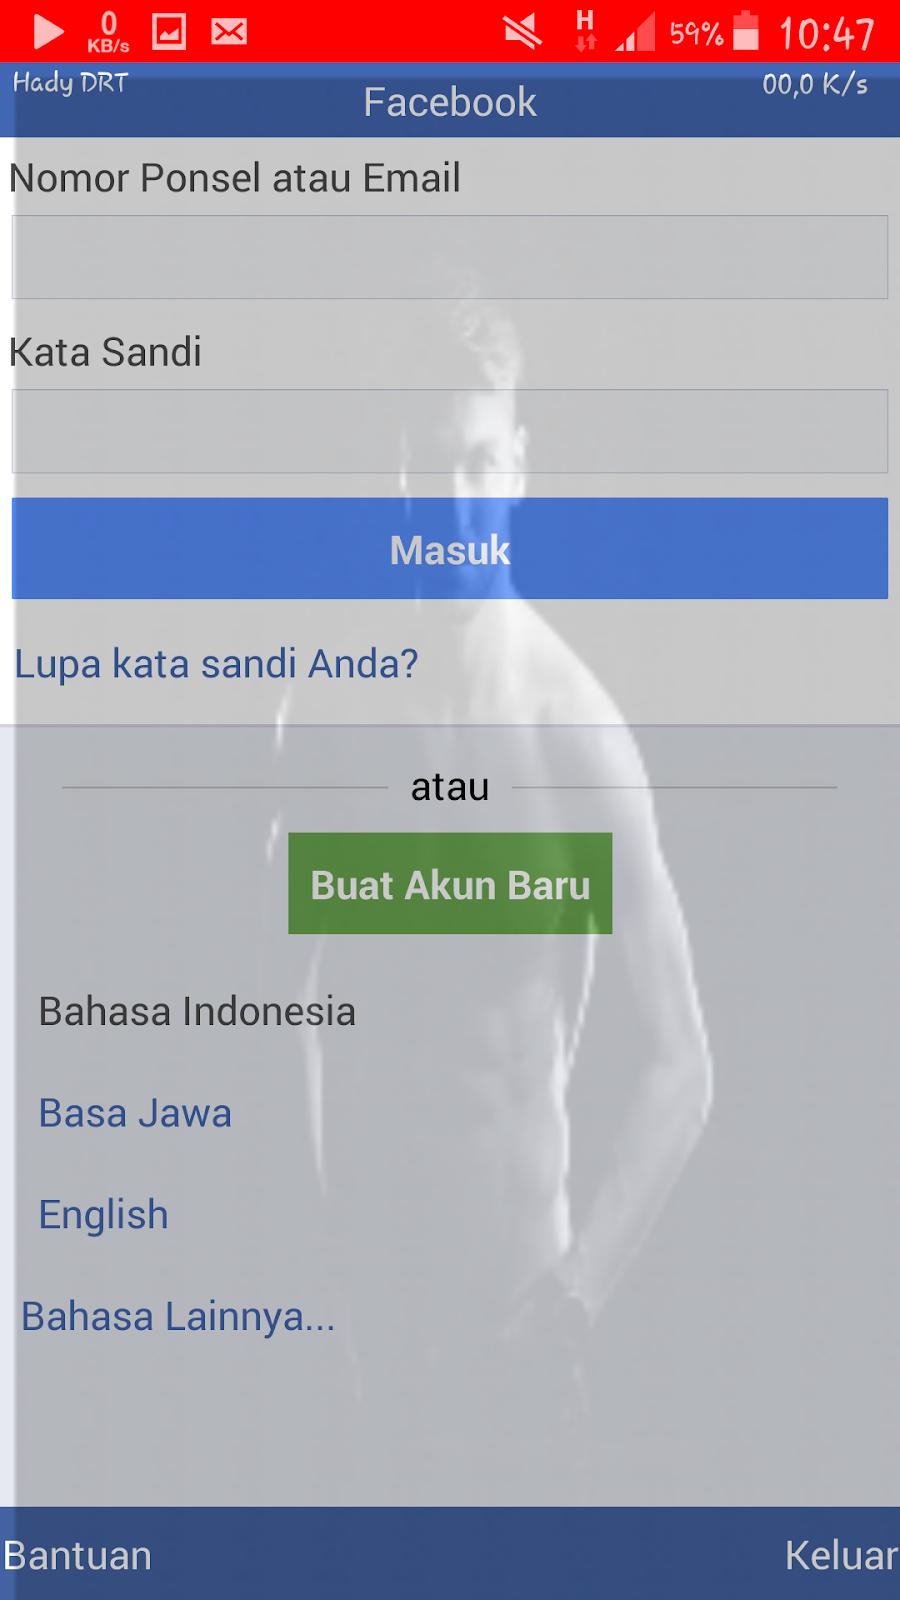 Fb Lite Mod Transparan For Android Download - Kumpulan Fb